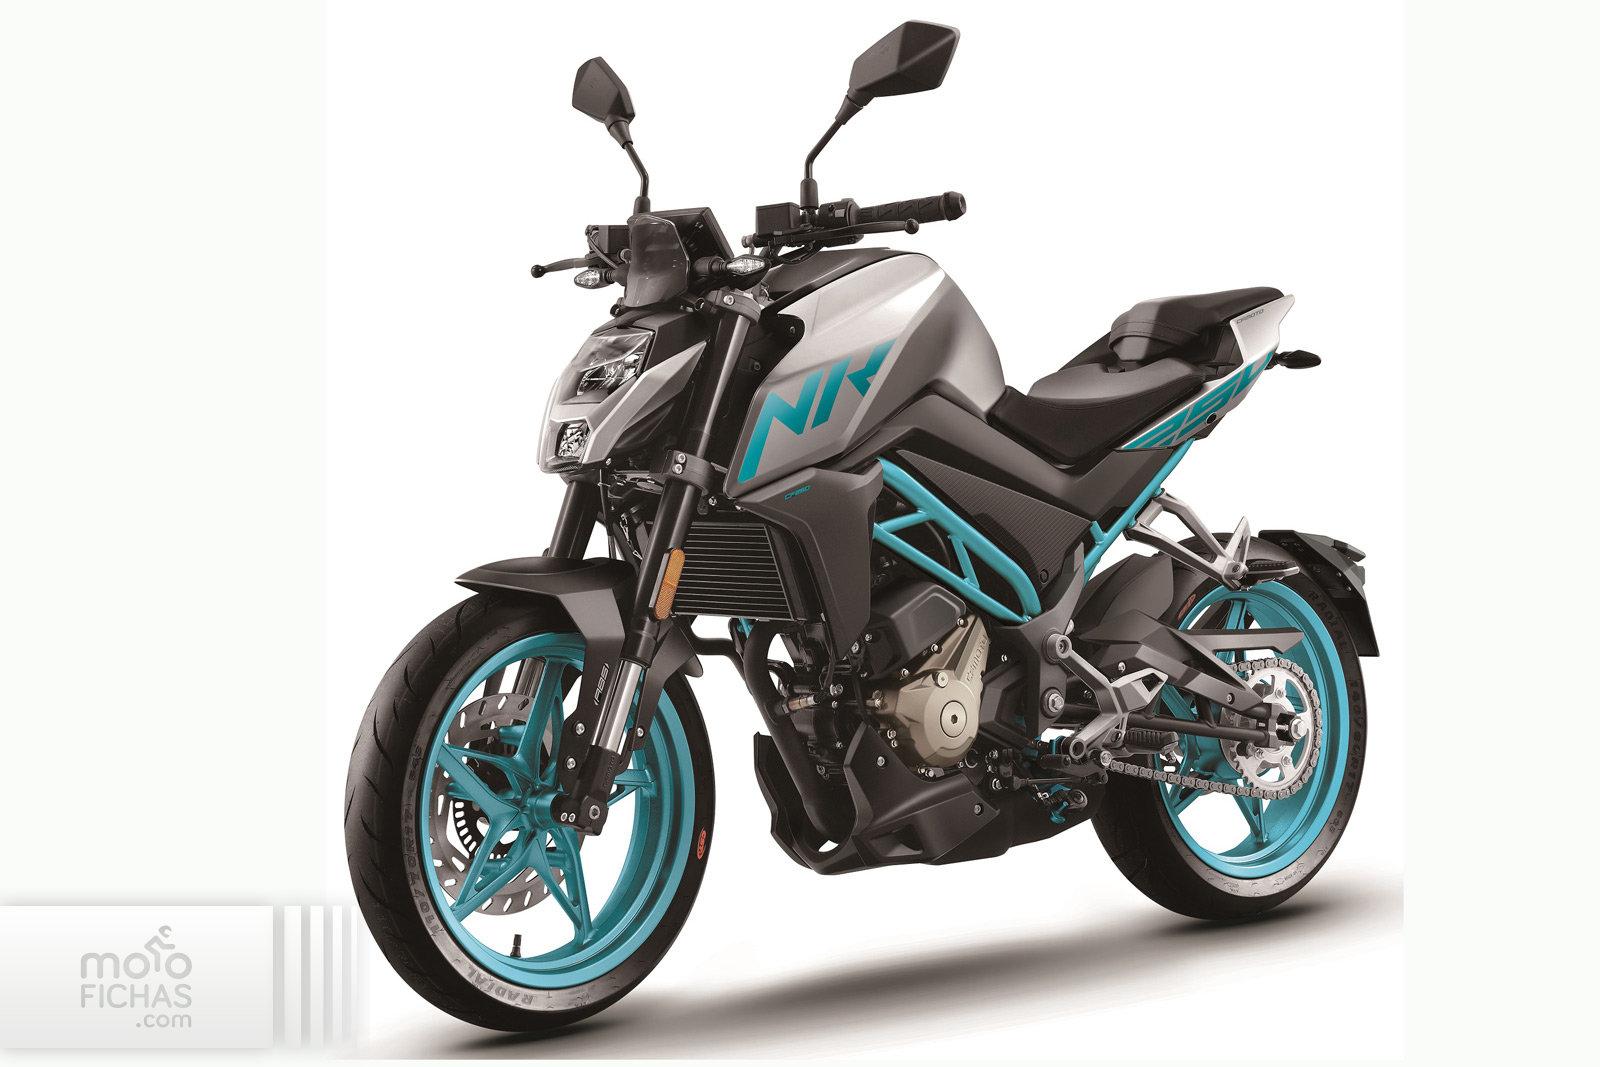 Cf Moto 250 NK Review - YouTube